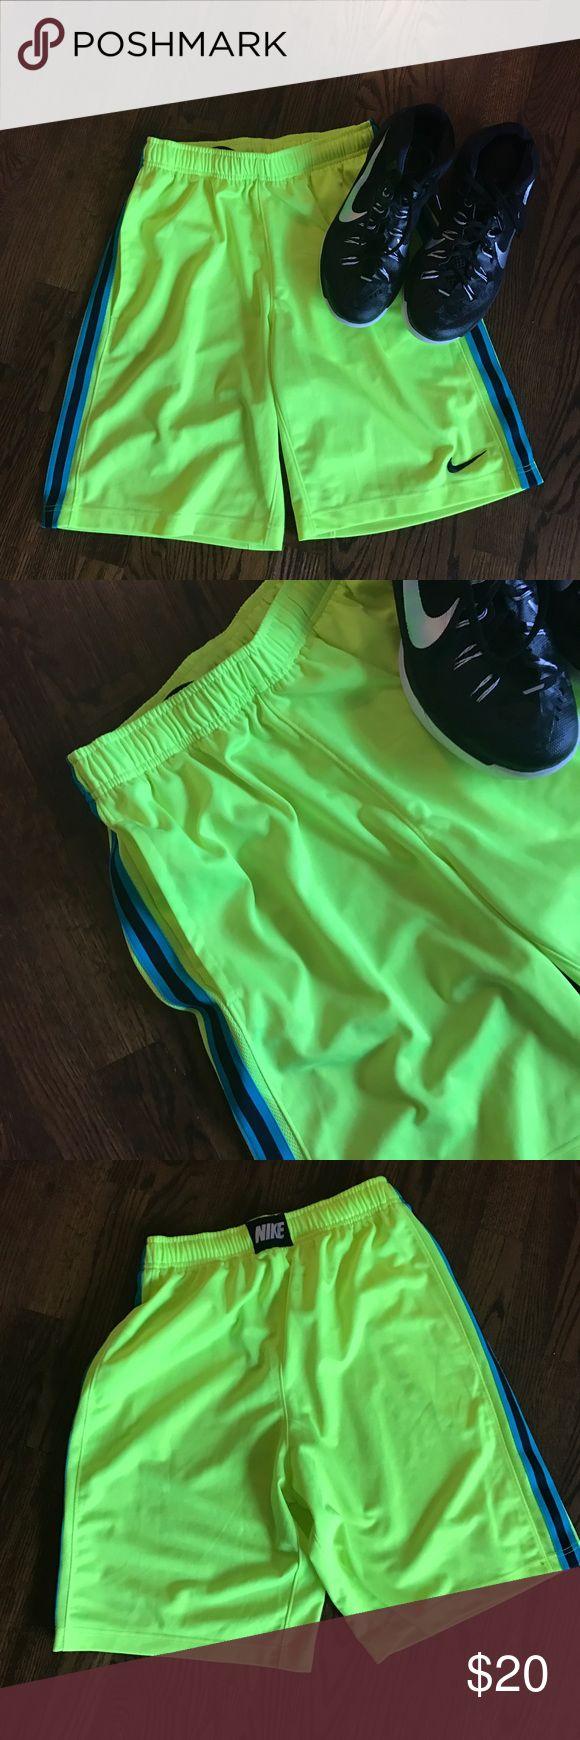 Nike basketball  shorts Nike basketball shorts like new condition. Bright yellow, drawstring waste, pockets. Nike Shorts Athletic